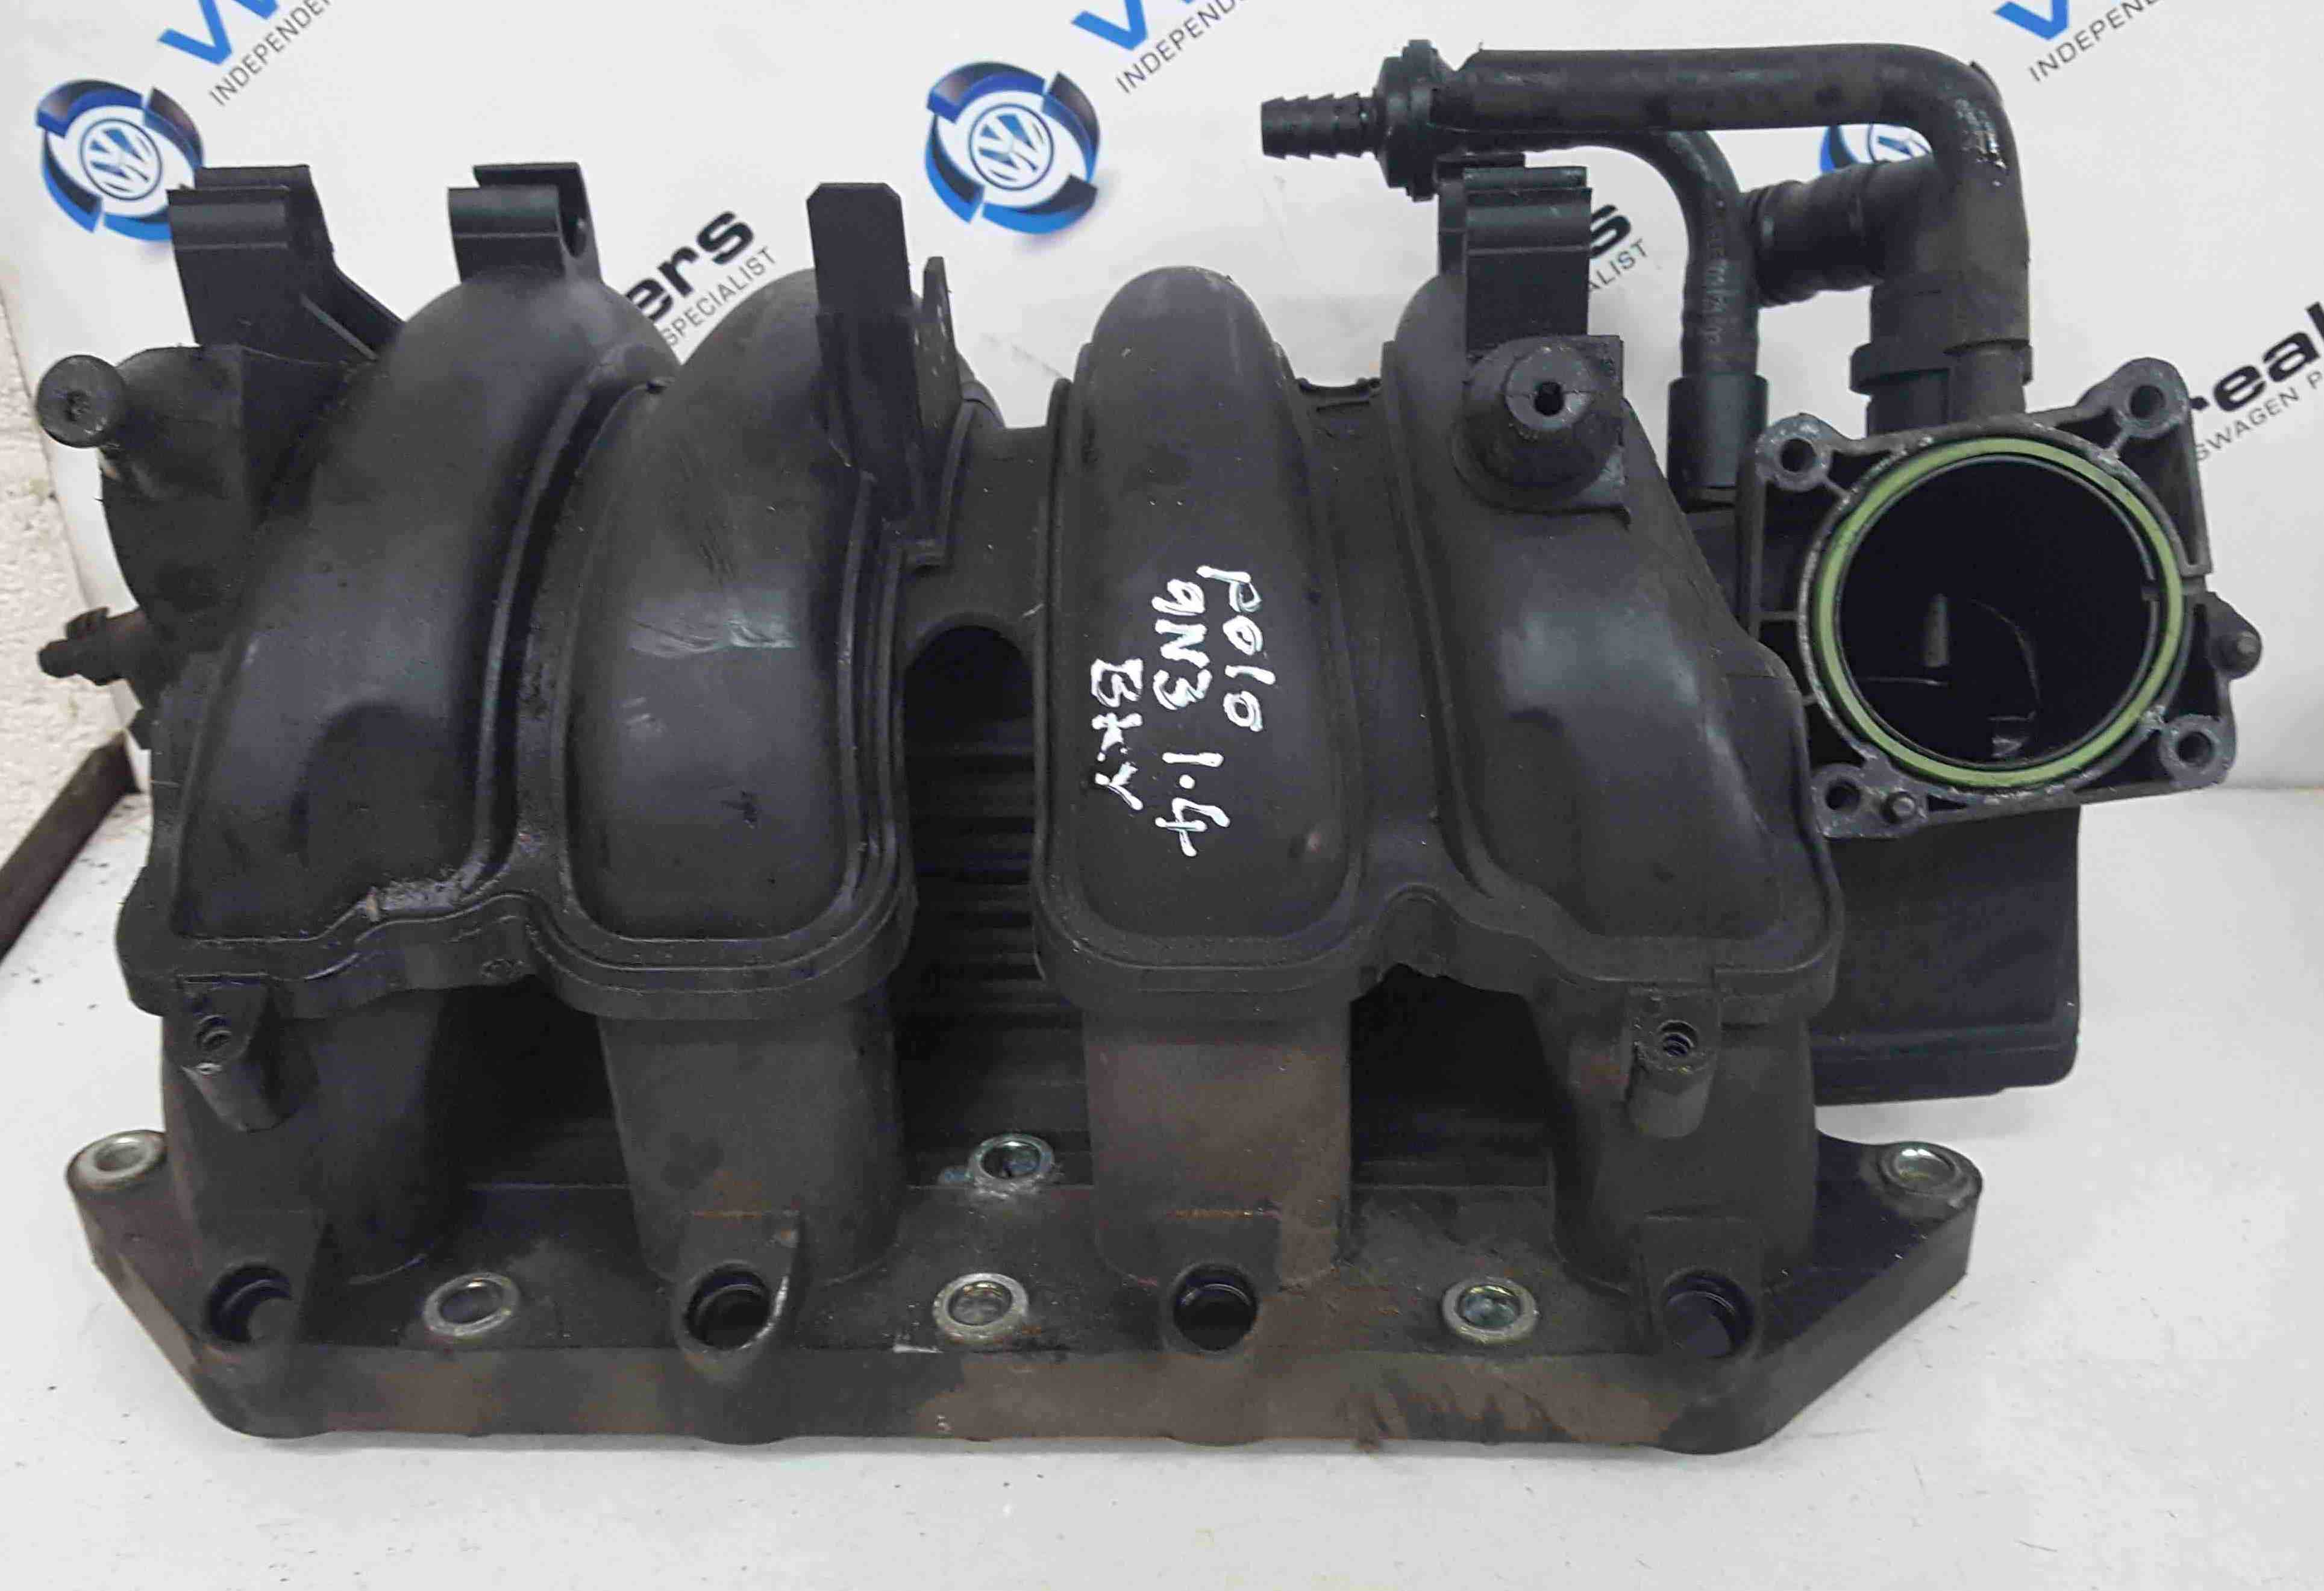 Volkswagen Polo 9N3 2006-2008 1.4 16v Inlet Manifold Mani BKY 036129711R